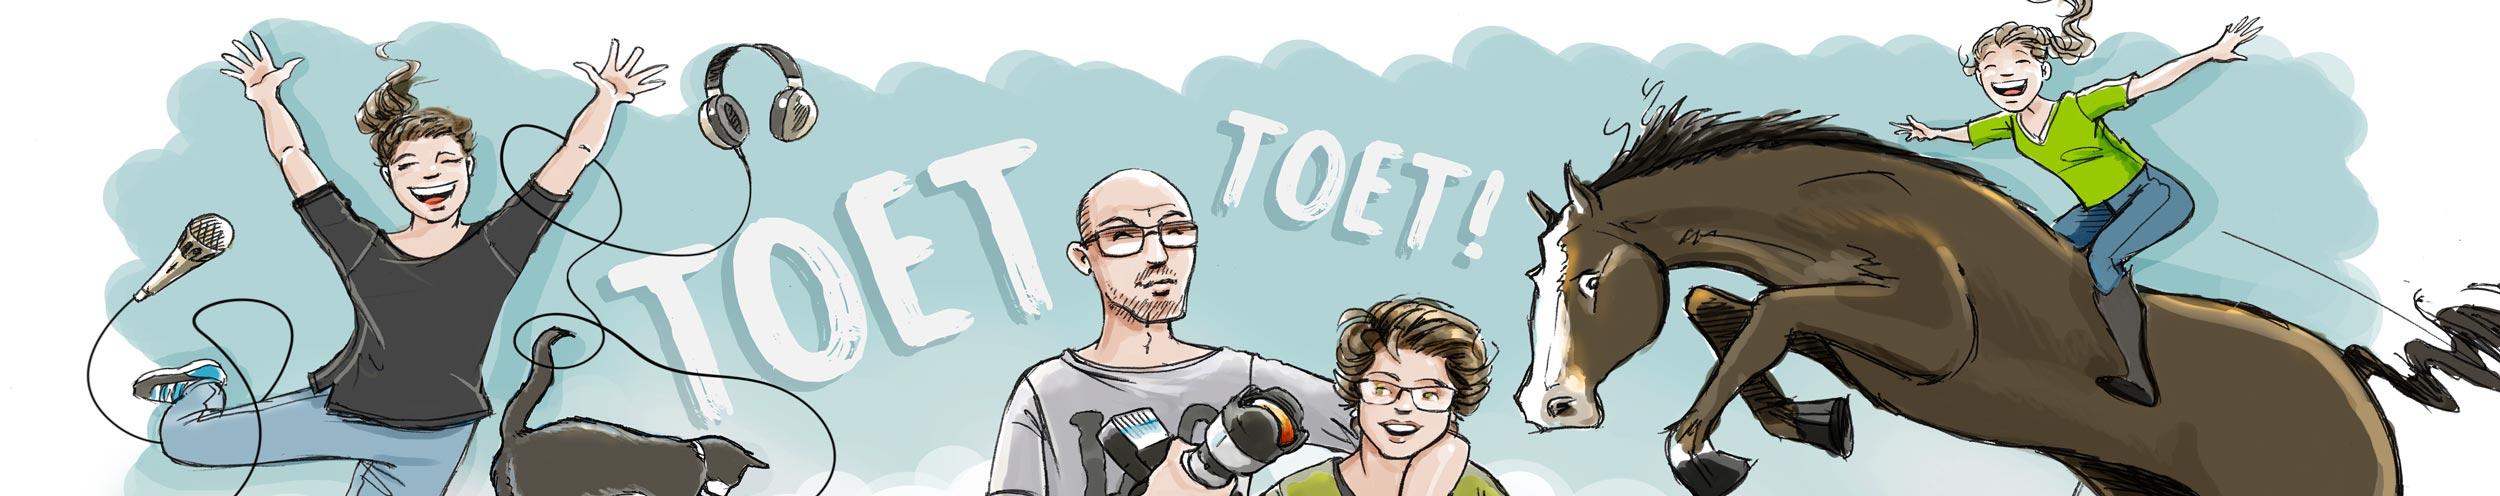 Karikatuur-cadeau-sfeerbanners-001b.jpg